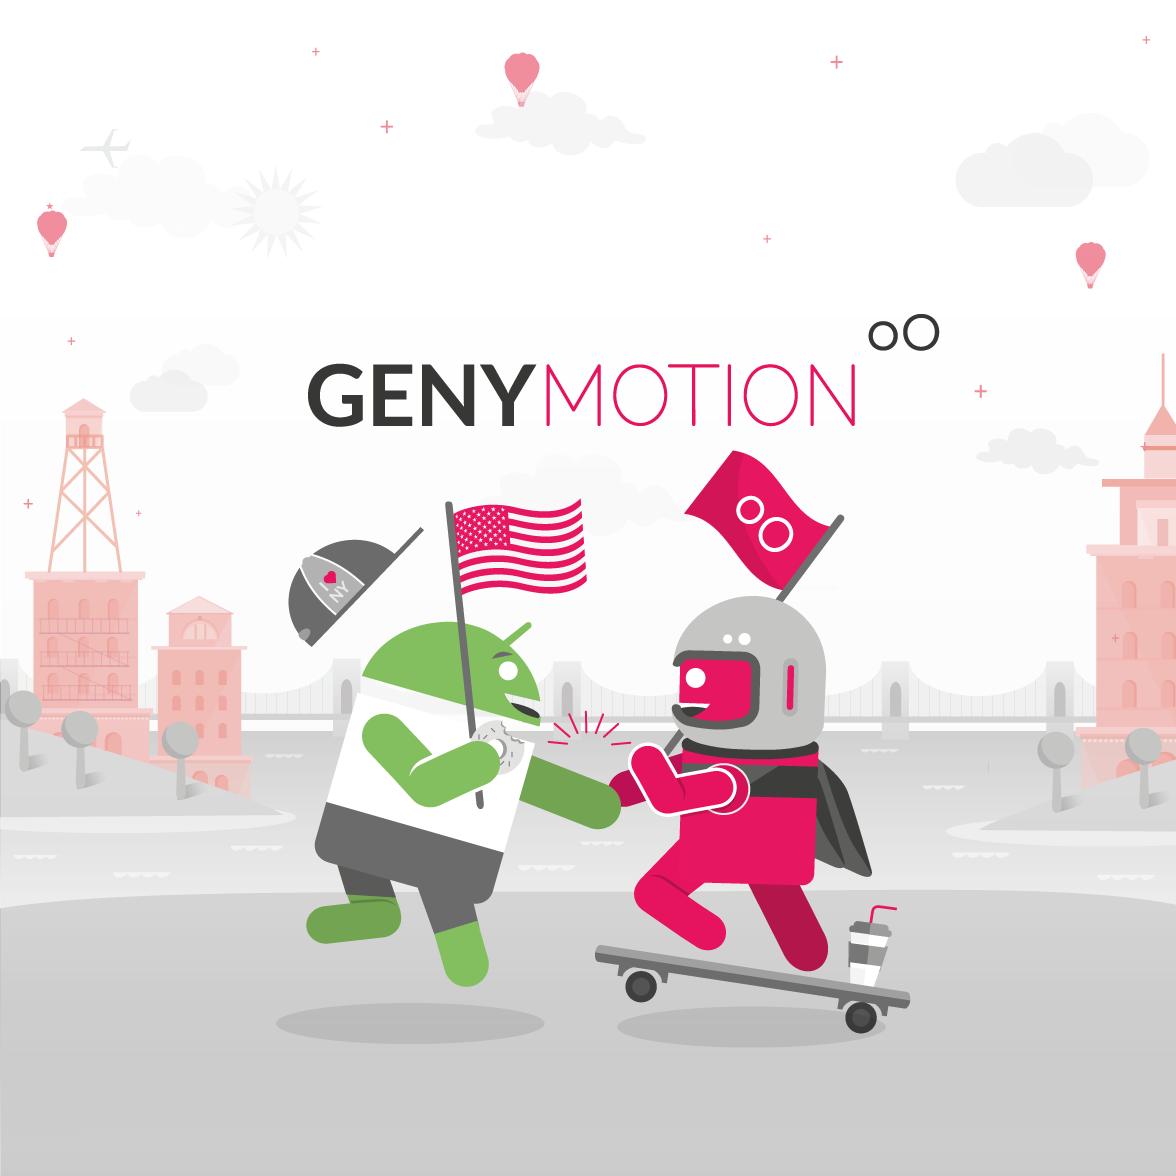 genymotion-droidcon-nyc-2015